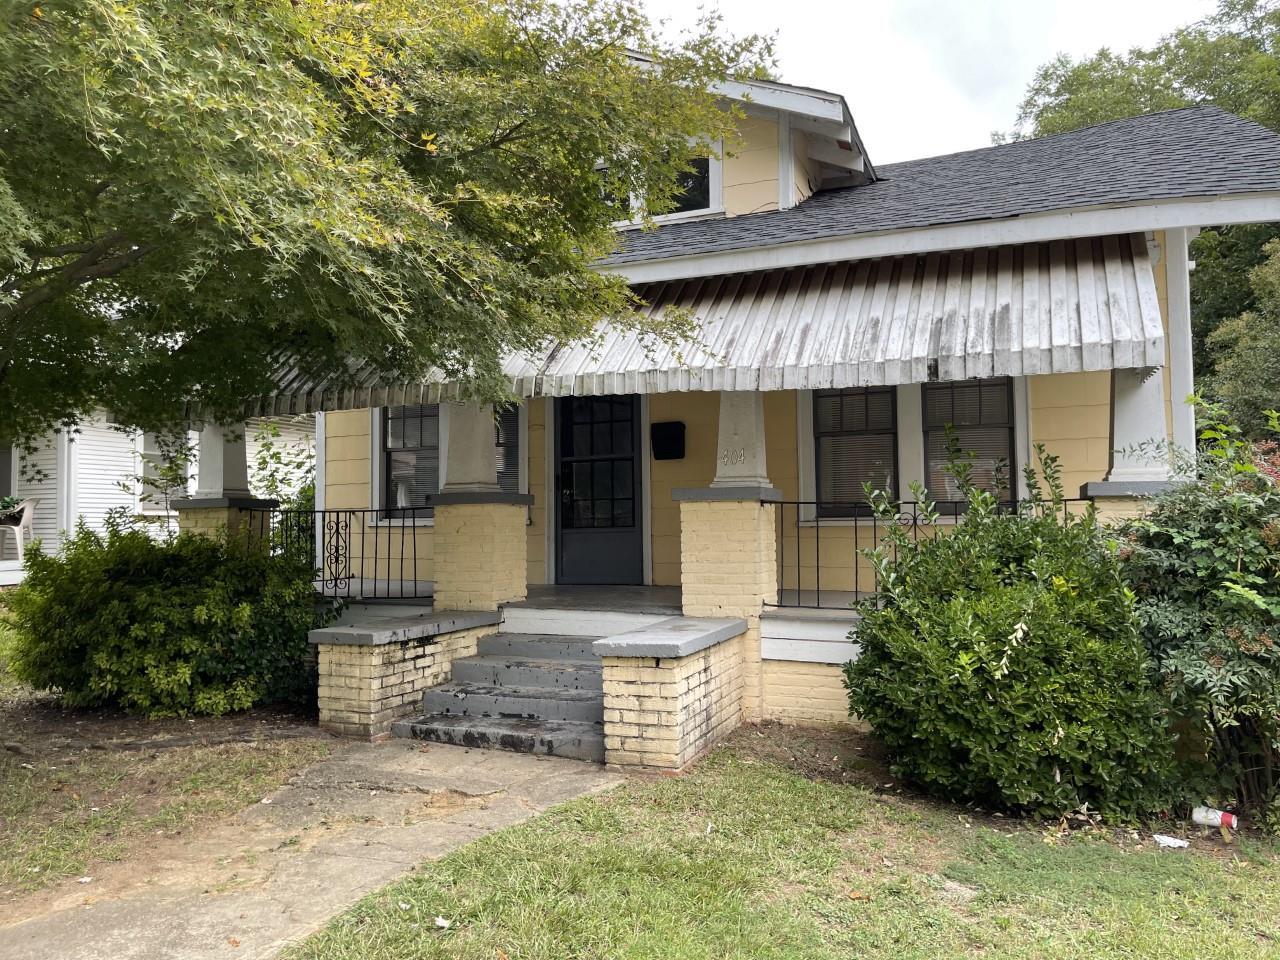 Image of 404 Chamberlain Street Raleigh, NC 27607